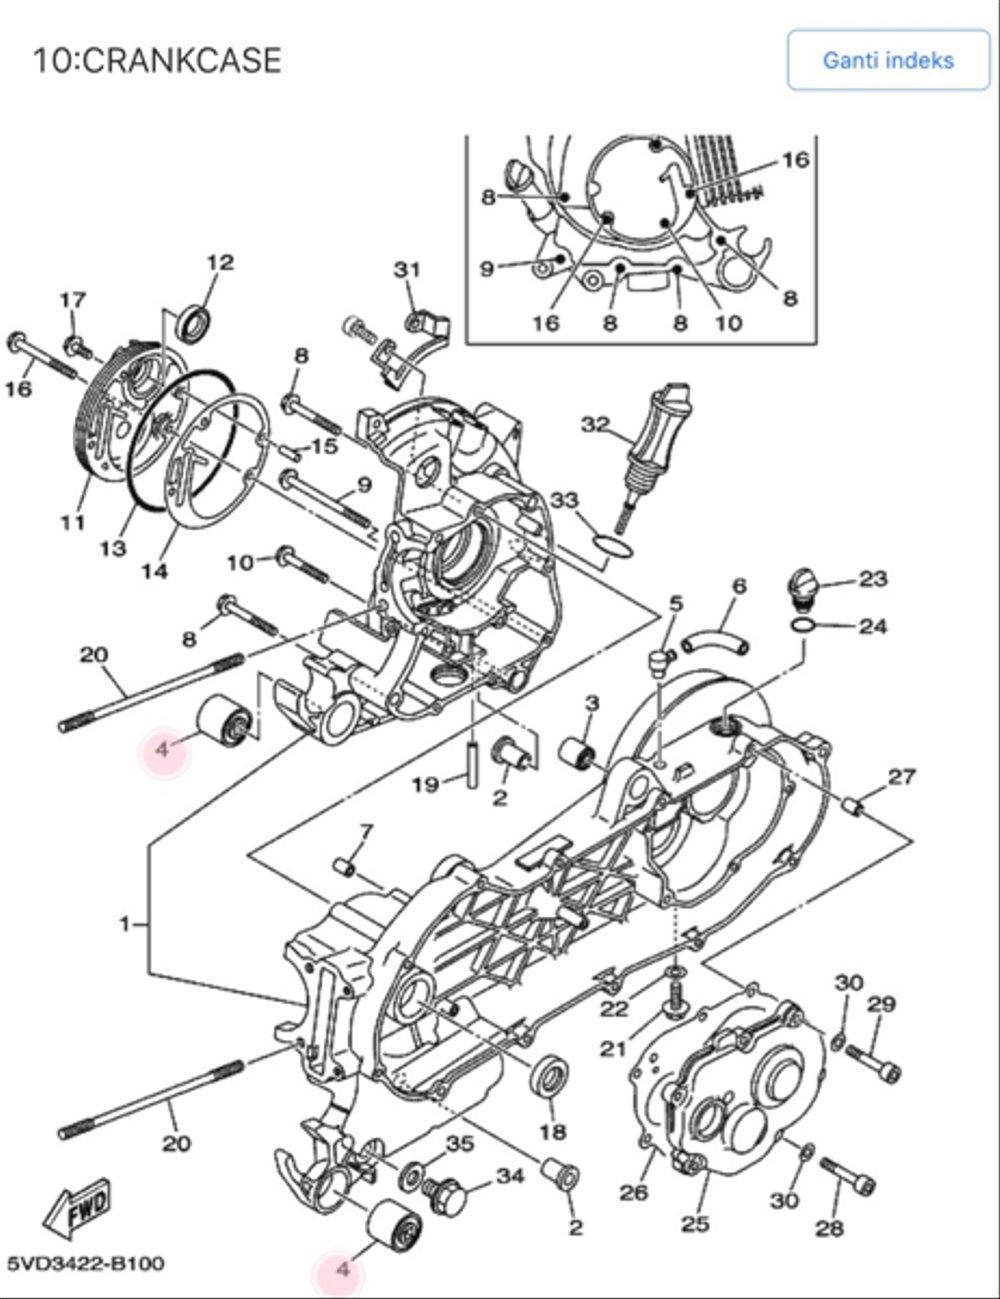 hight resolution of jual bagus engine mounting bos cvt nouvo asli yamaha di lapak diagram cvt nouvo